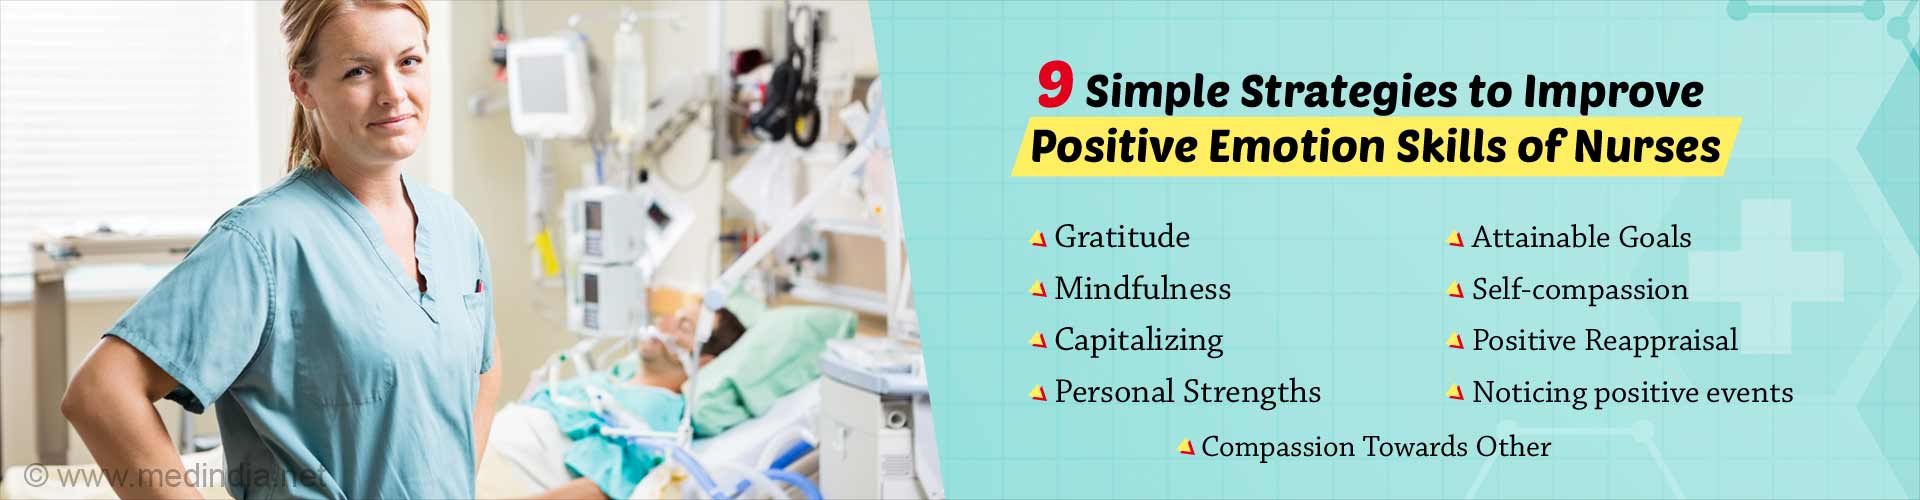 Increase Positive Emotion Skills of Nurses Using Simple Strategies